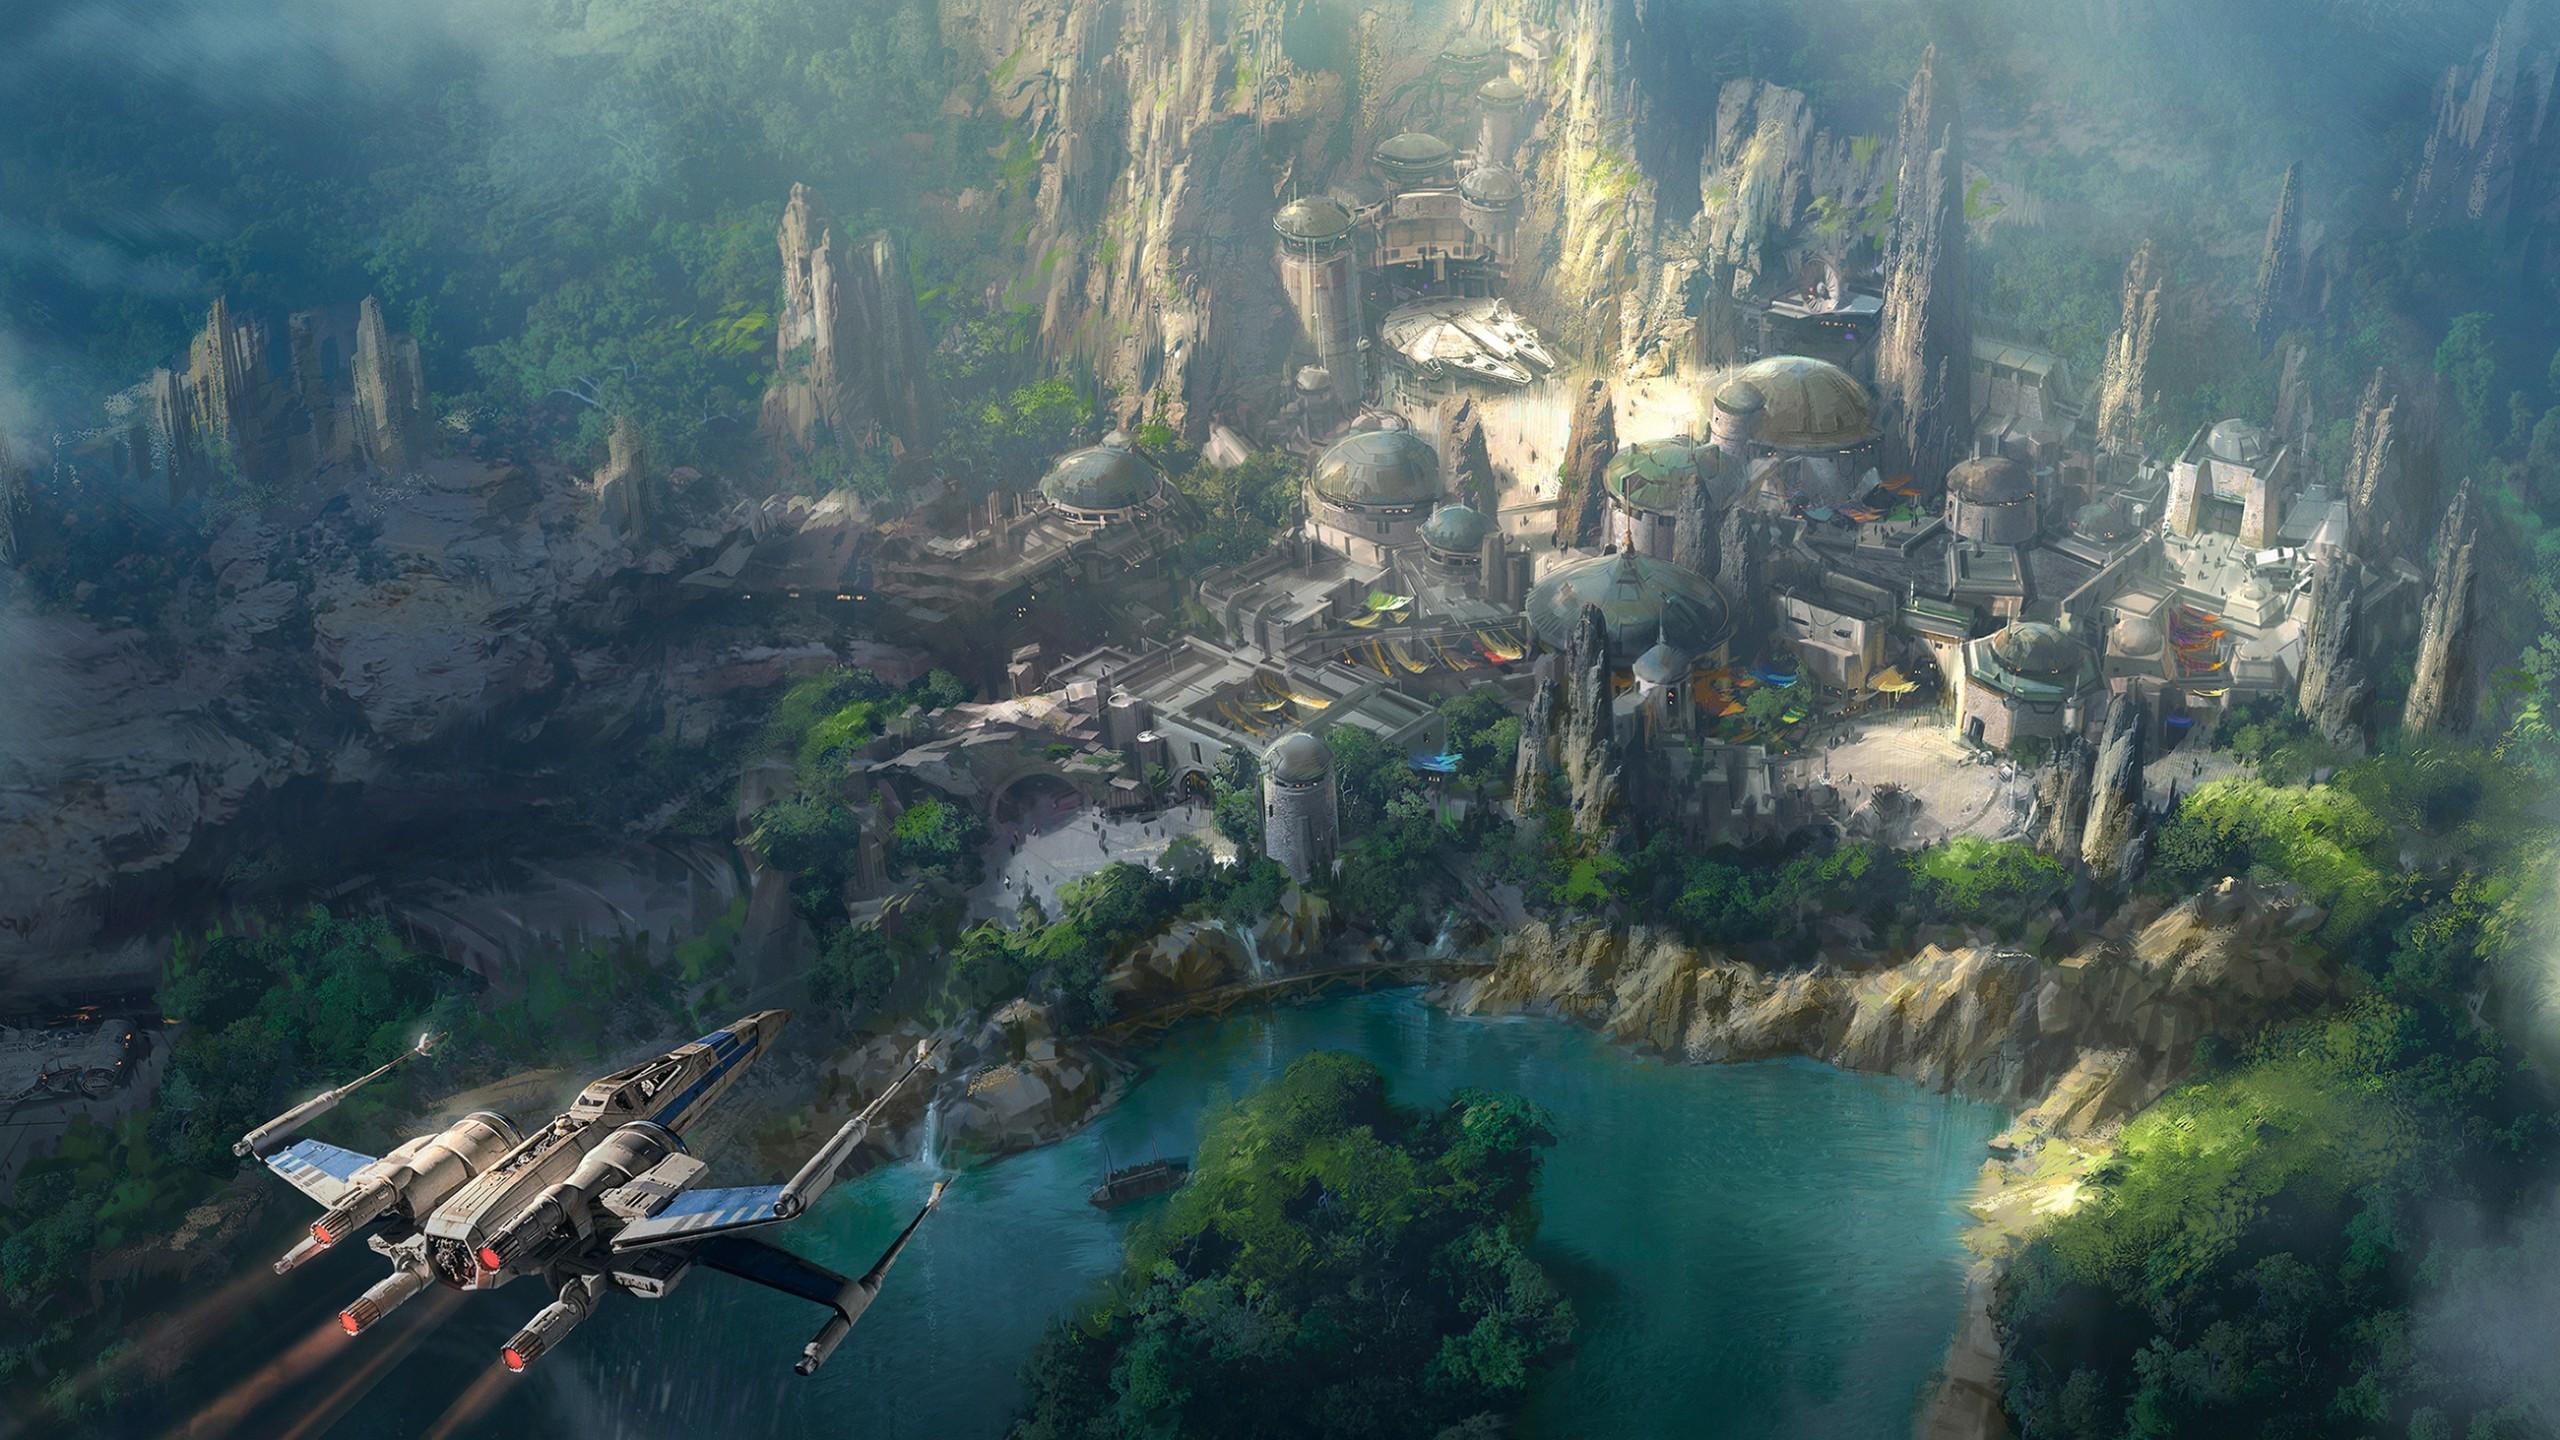 1024×768 1280×720 1280×800 1366×768 1440×900 1600×900 1680×1050 1920×1080  1920×1200 2880×1800. Tags: Disneyland, Star Wars Land, Concept, HD